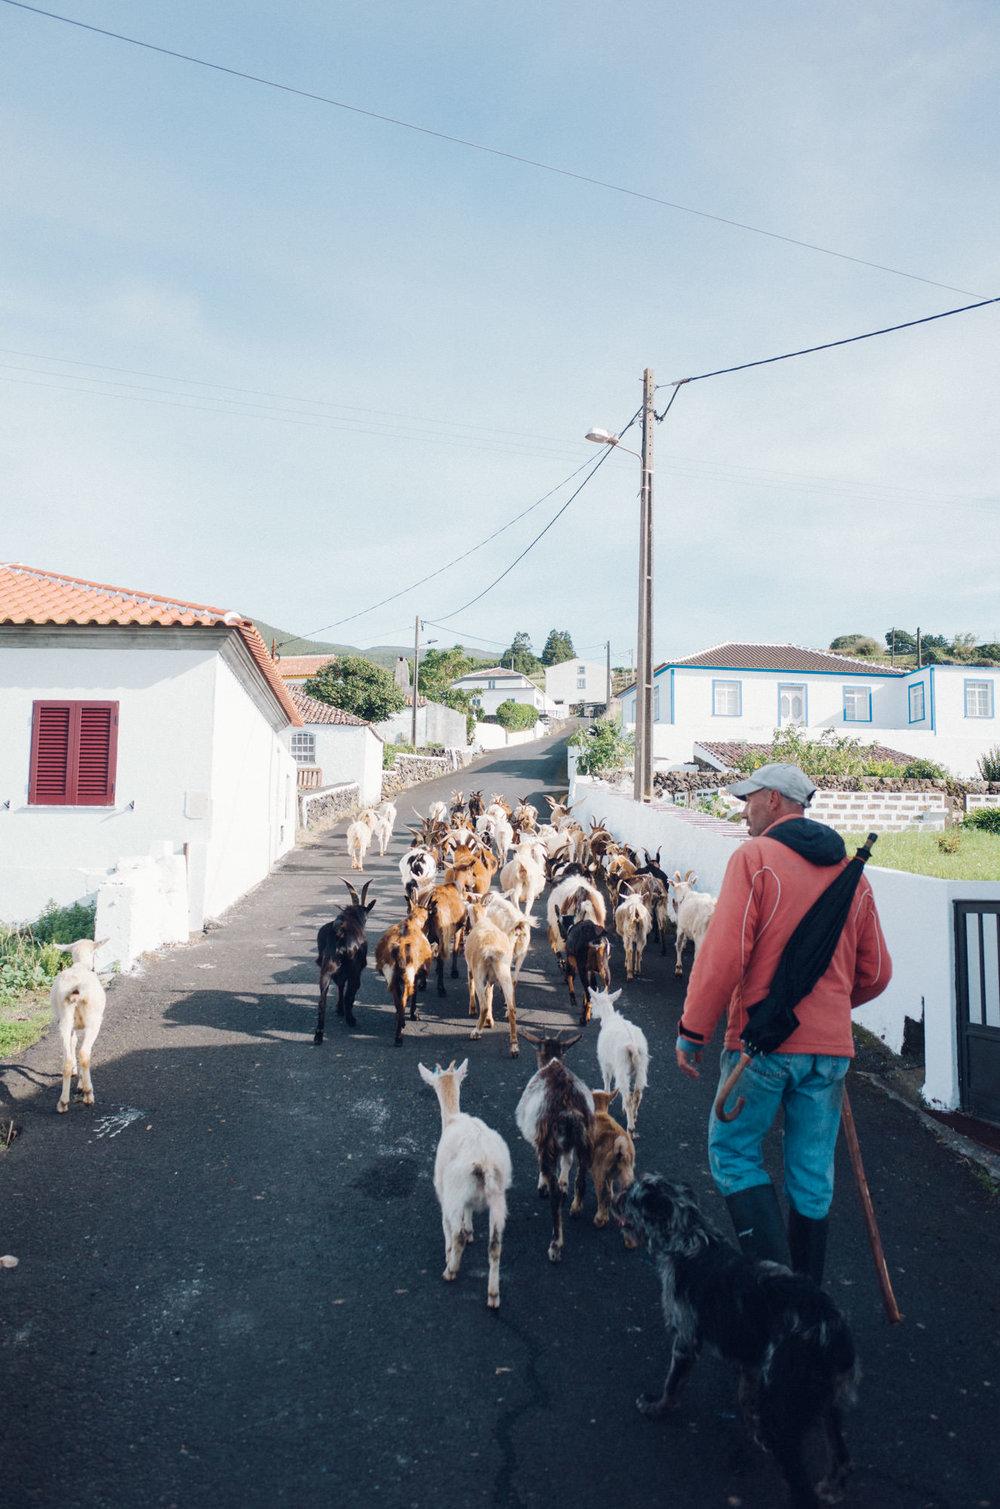 wrenee-renee-lusano-azores-portugal-12.jpg